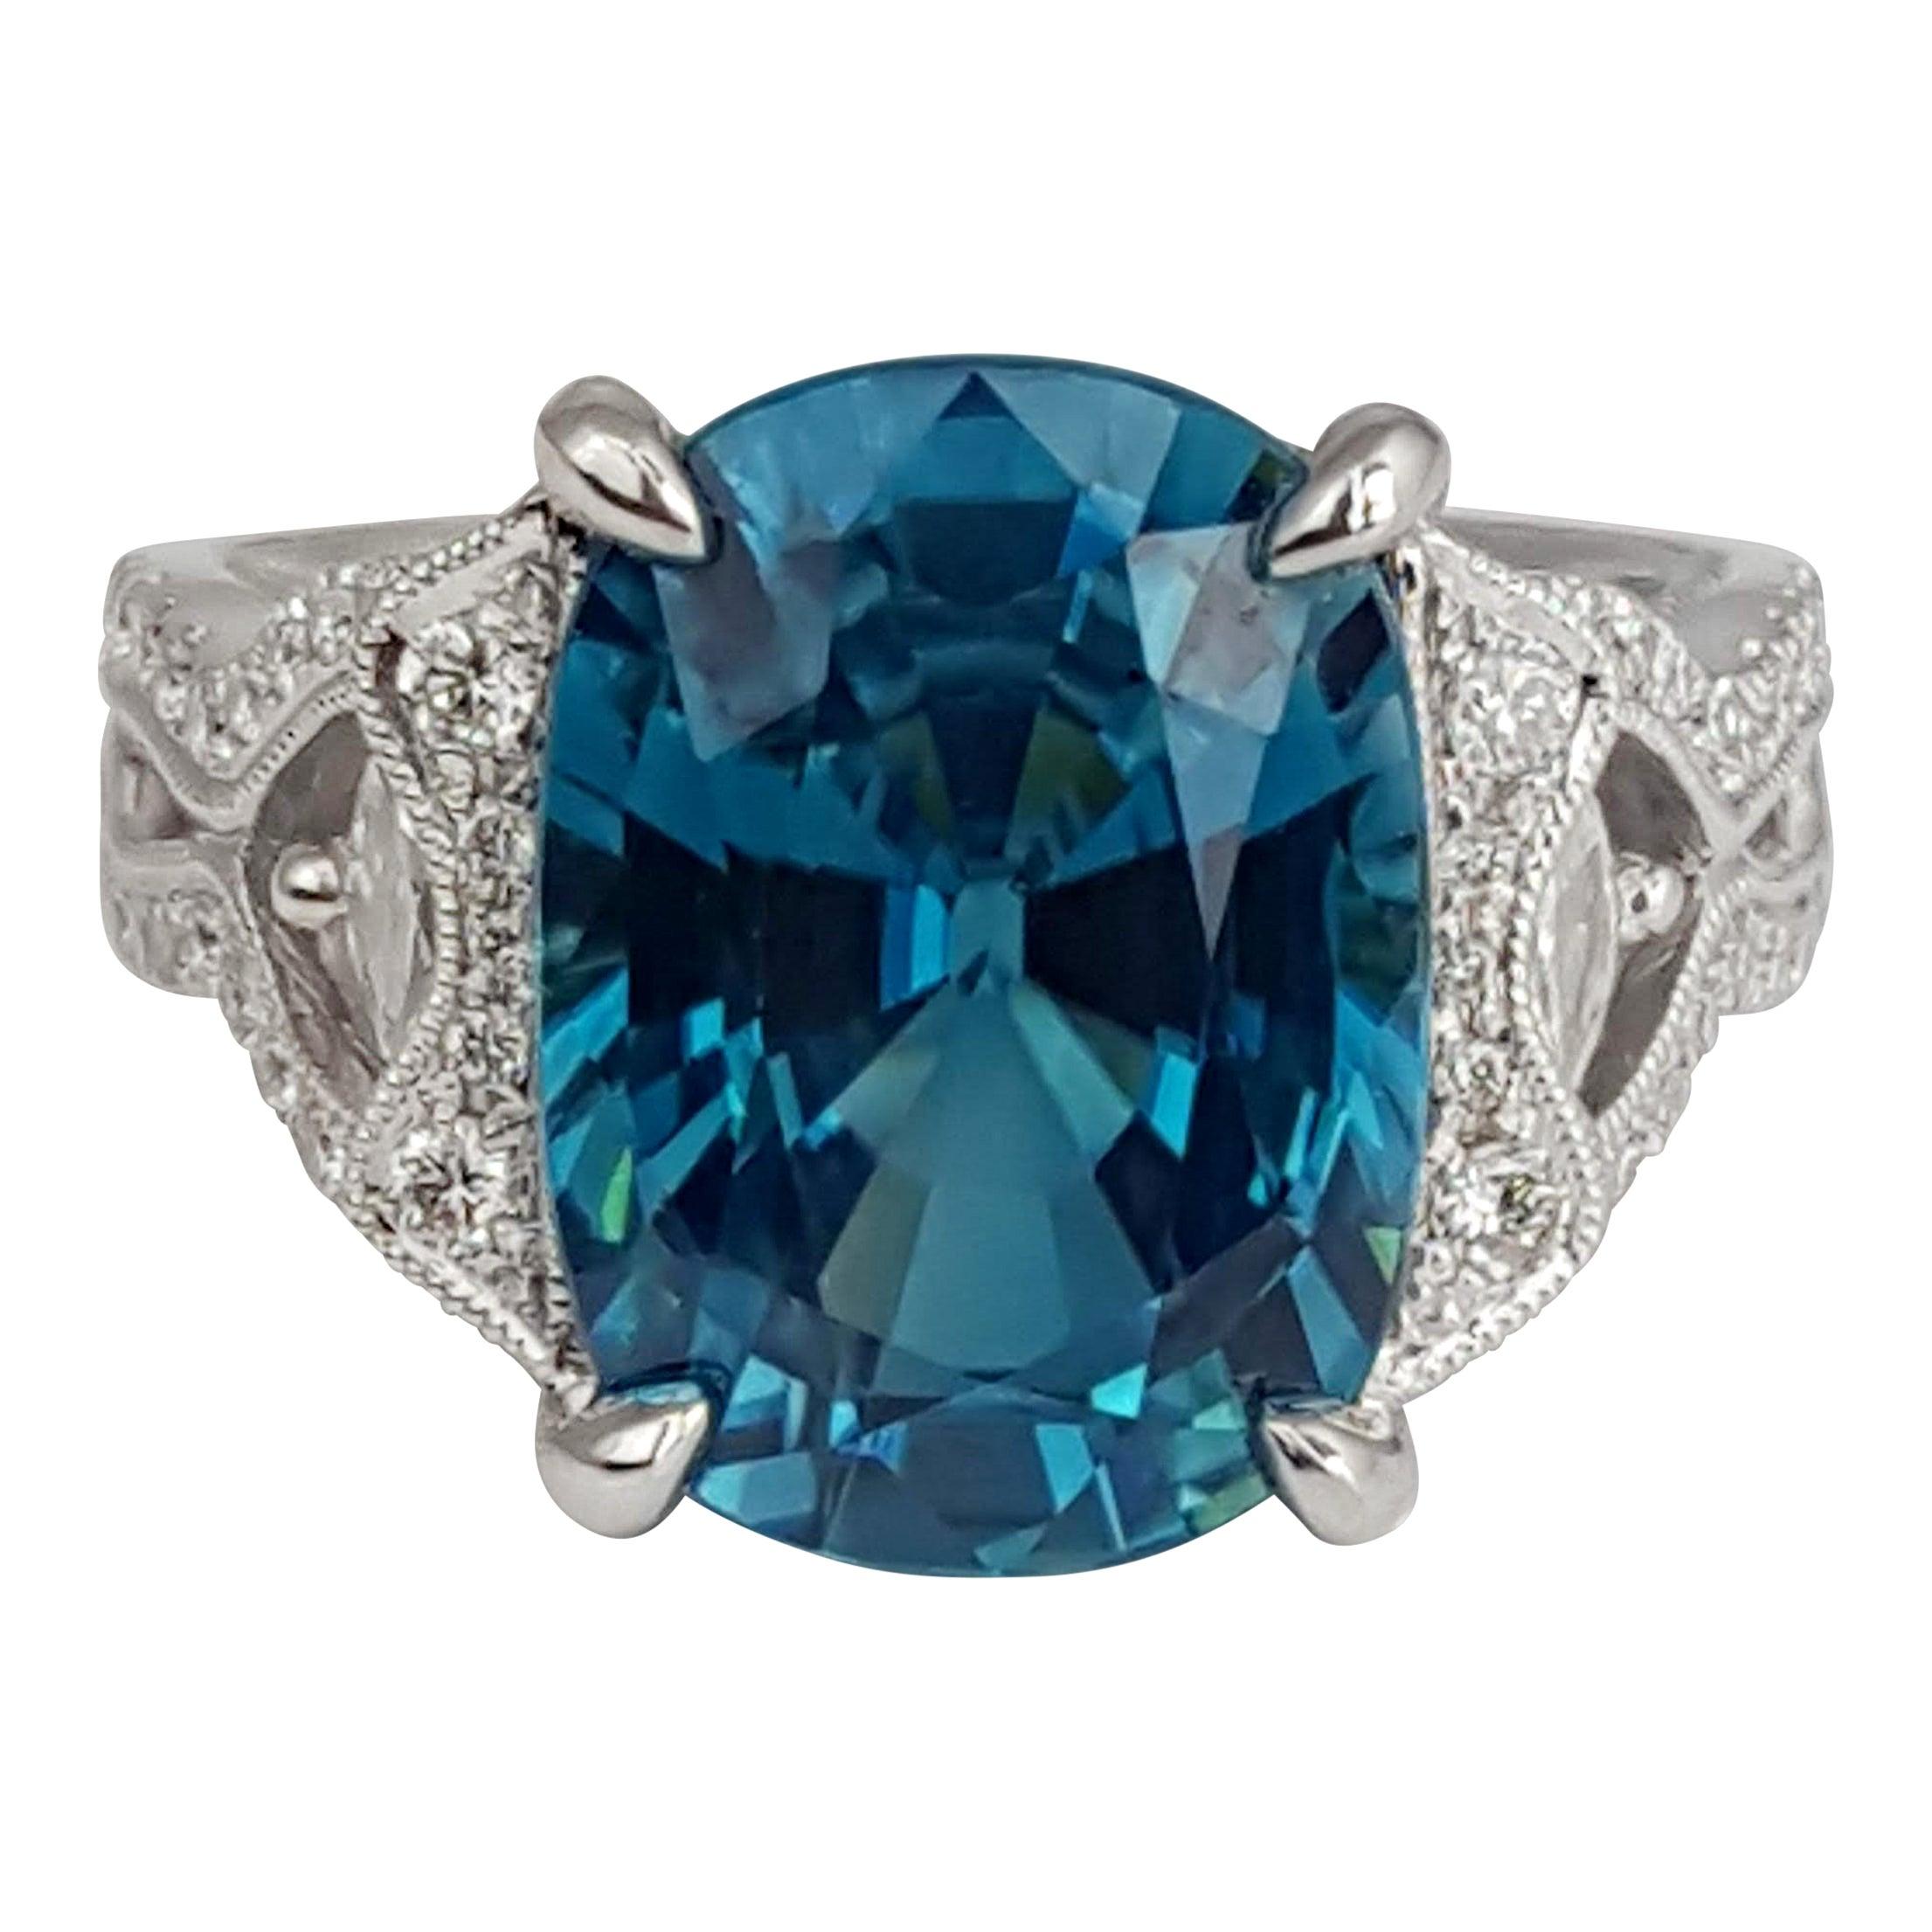 DiamondTown 9.98 Carat Oval Cut Blue Zircon and 0.54 Carat Diamond Ring